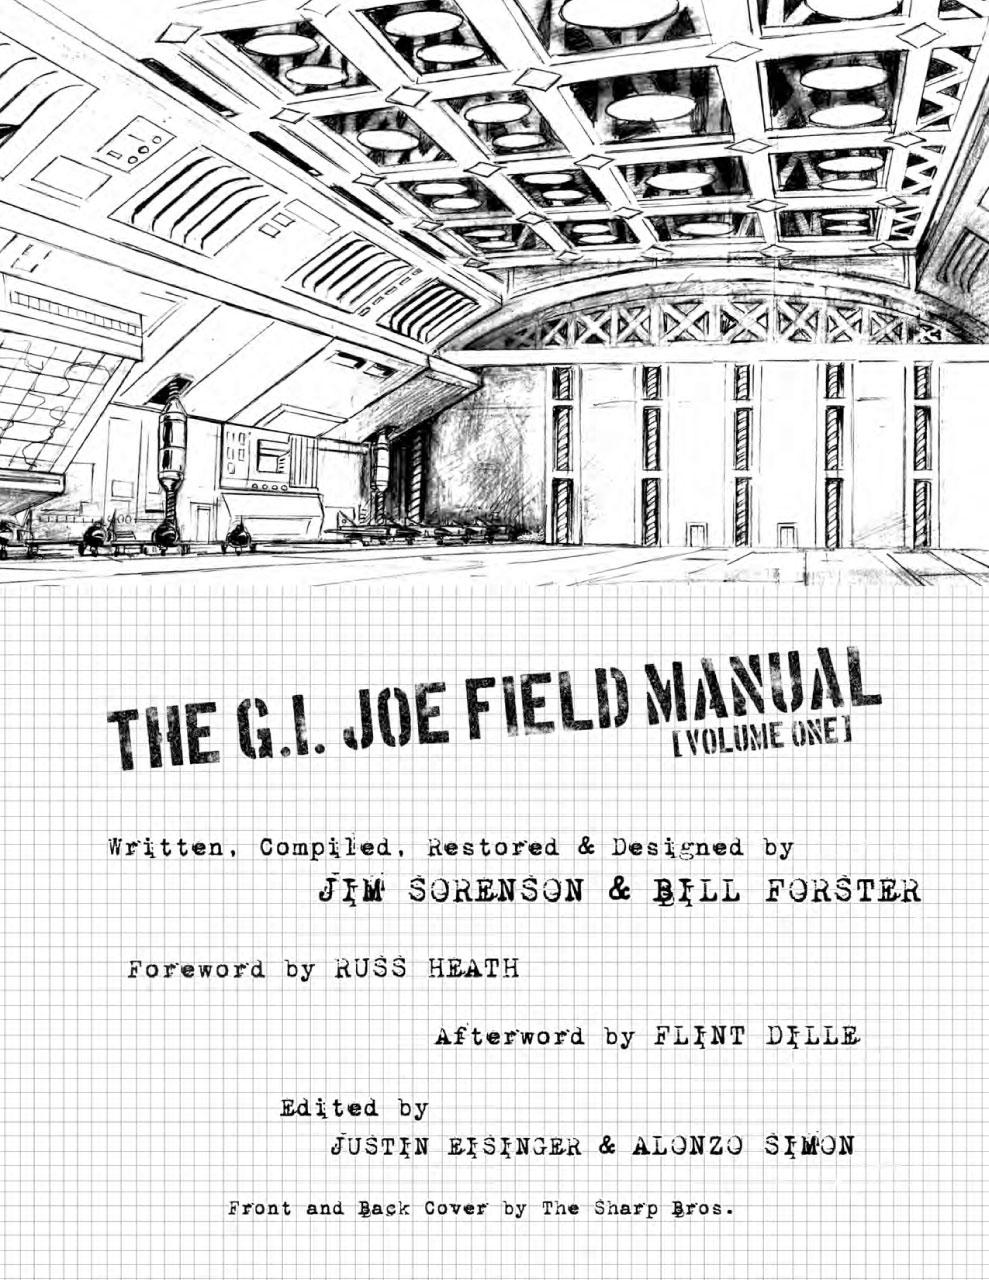 Snake Eyes And Storm Shadow #16 And GI Joe Field Manual